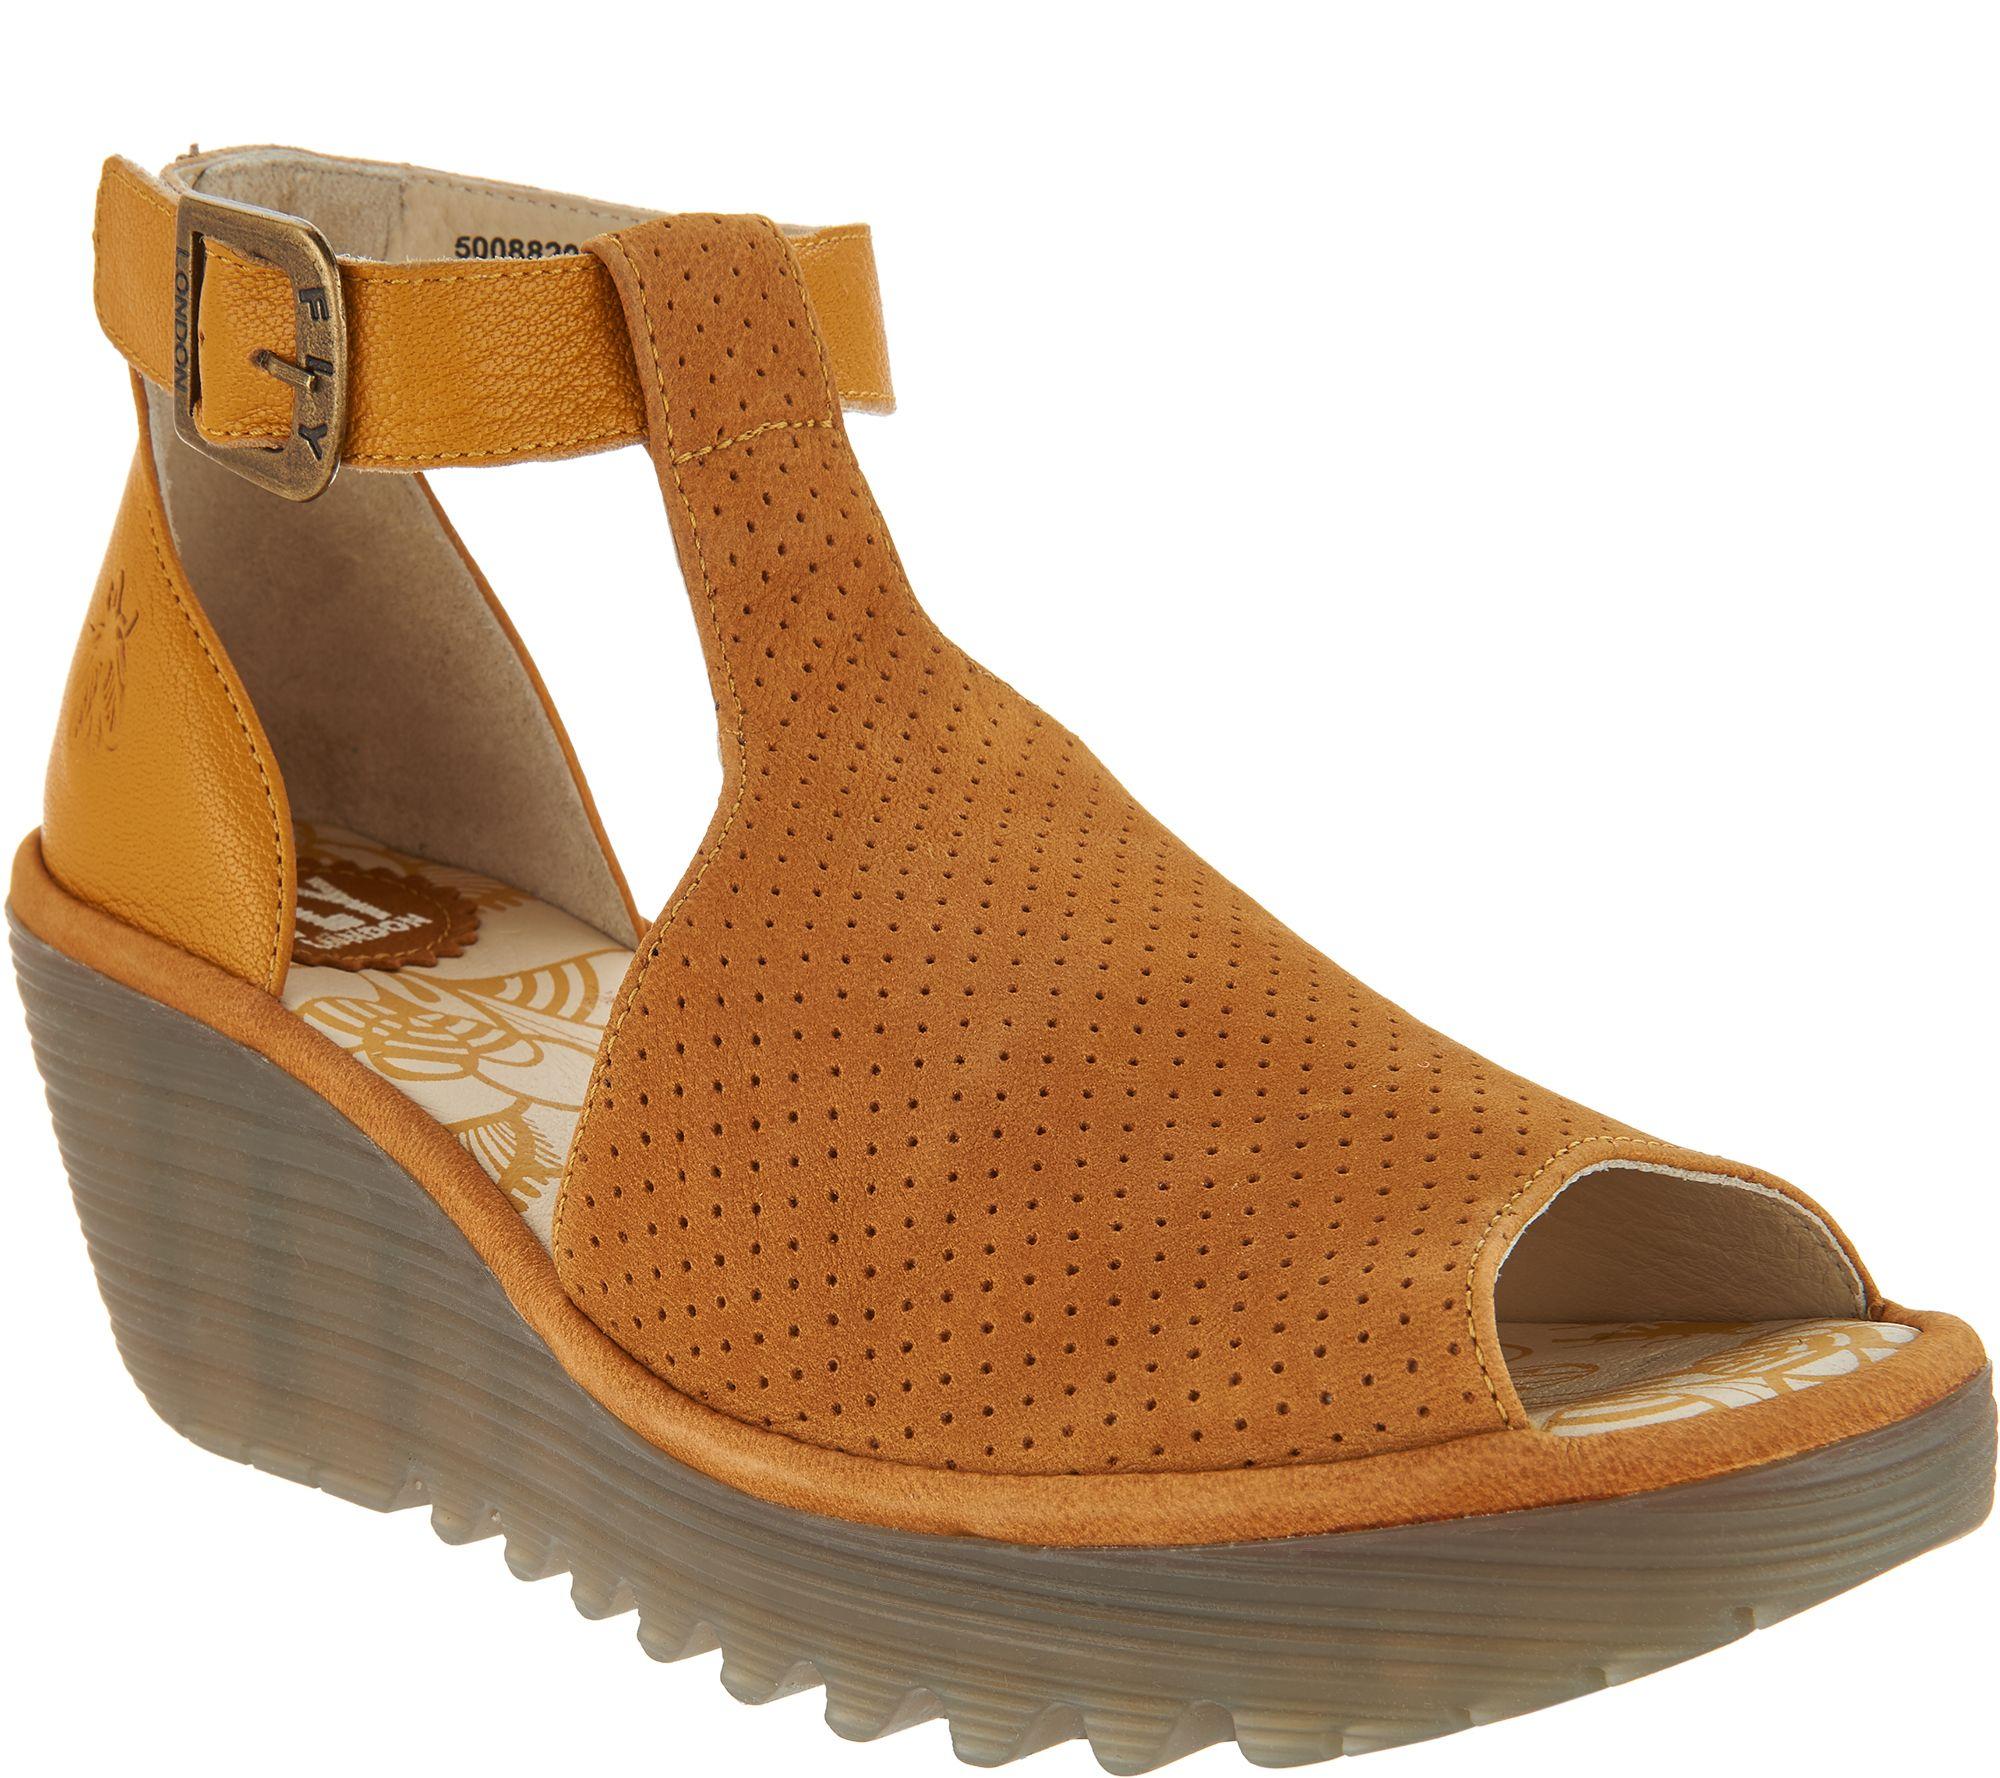 comforter com dp women by mayflower platforms wedges comfortable amazon aerosoles most wedge s sandal womens